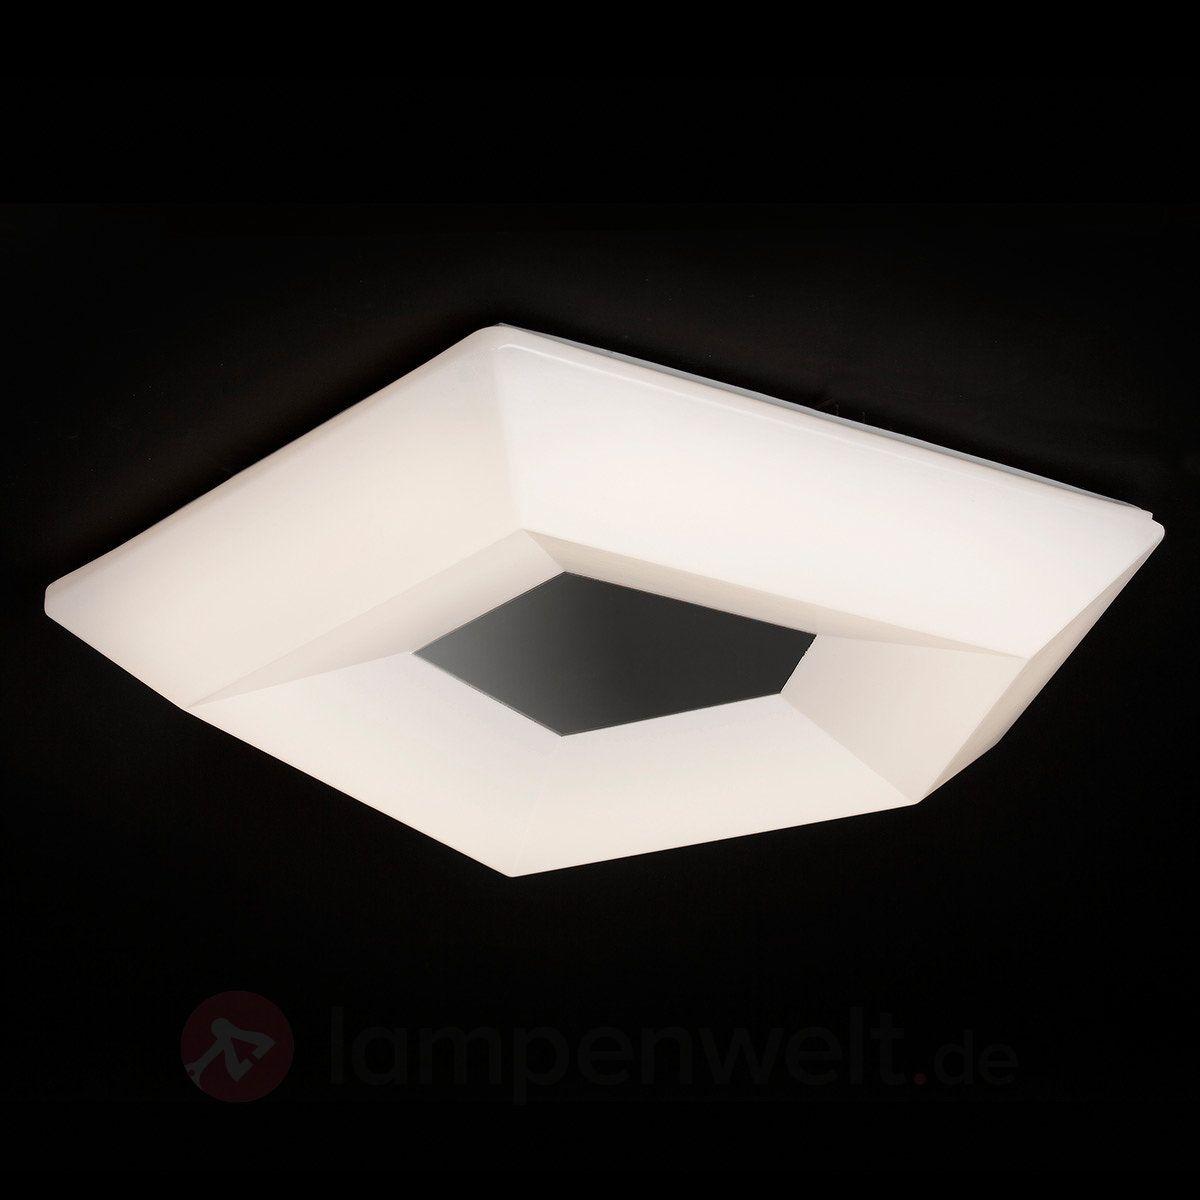 LED Deckenleuchte City 6542206 | Led deckenleuchte, Lampen